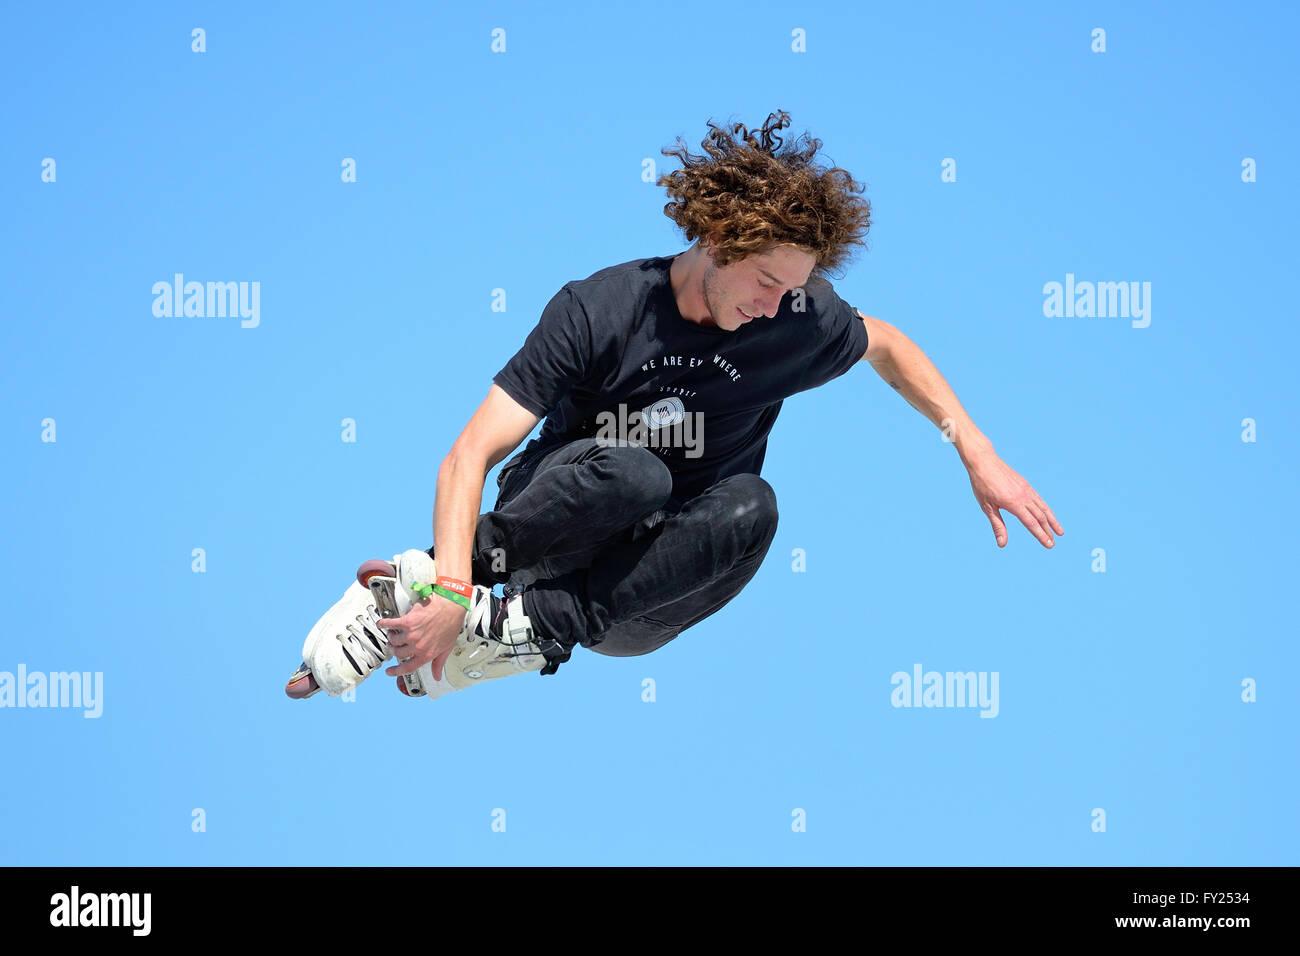 BARCELONA - JUN 28: A professional skater at the Inline skating